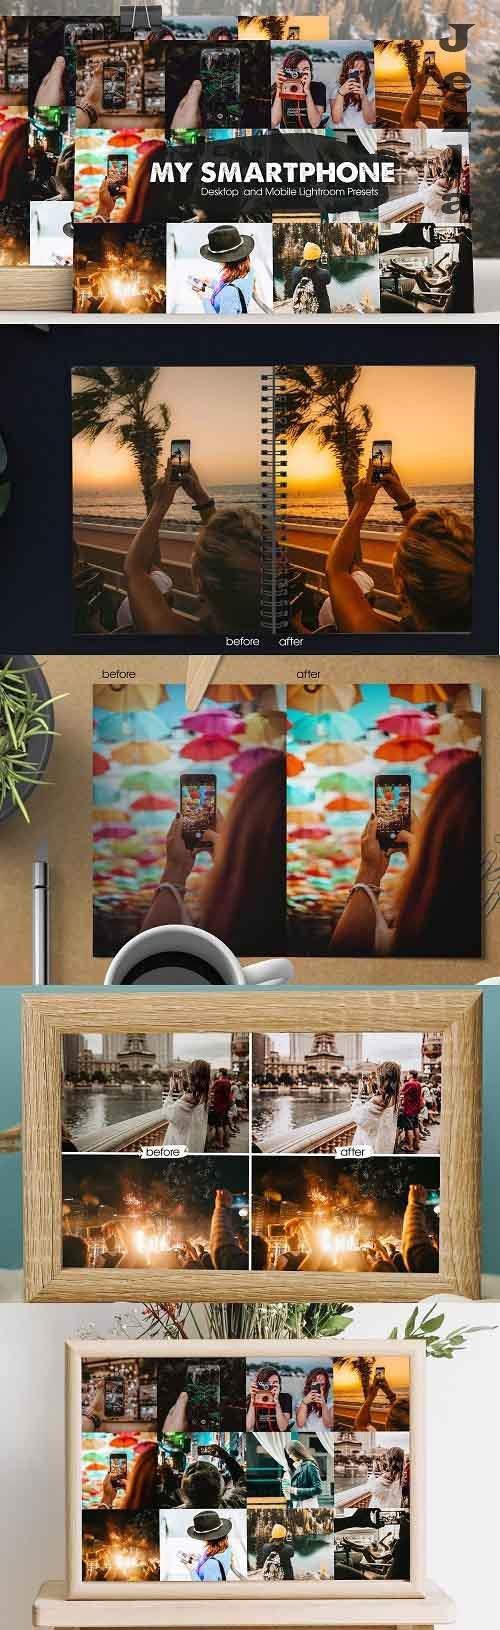 My Smartphone Lightroom Presets - 5417164